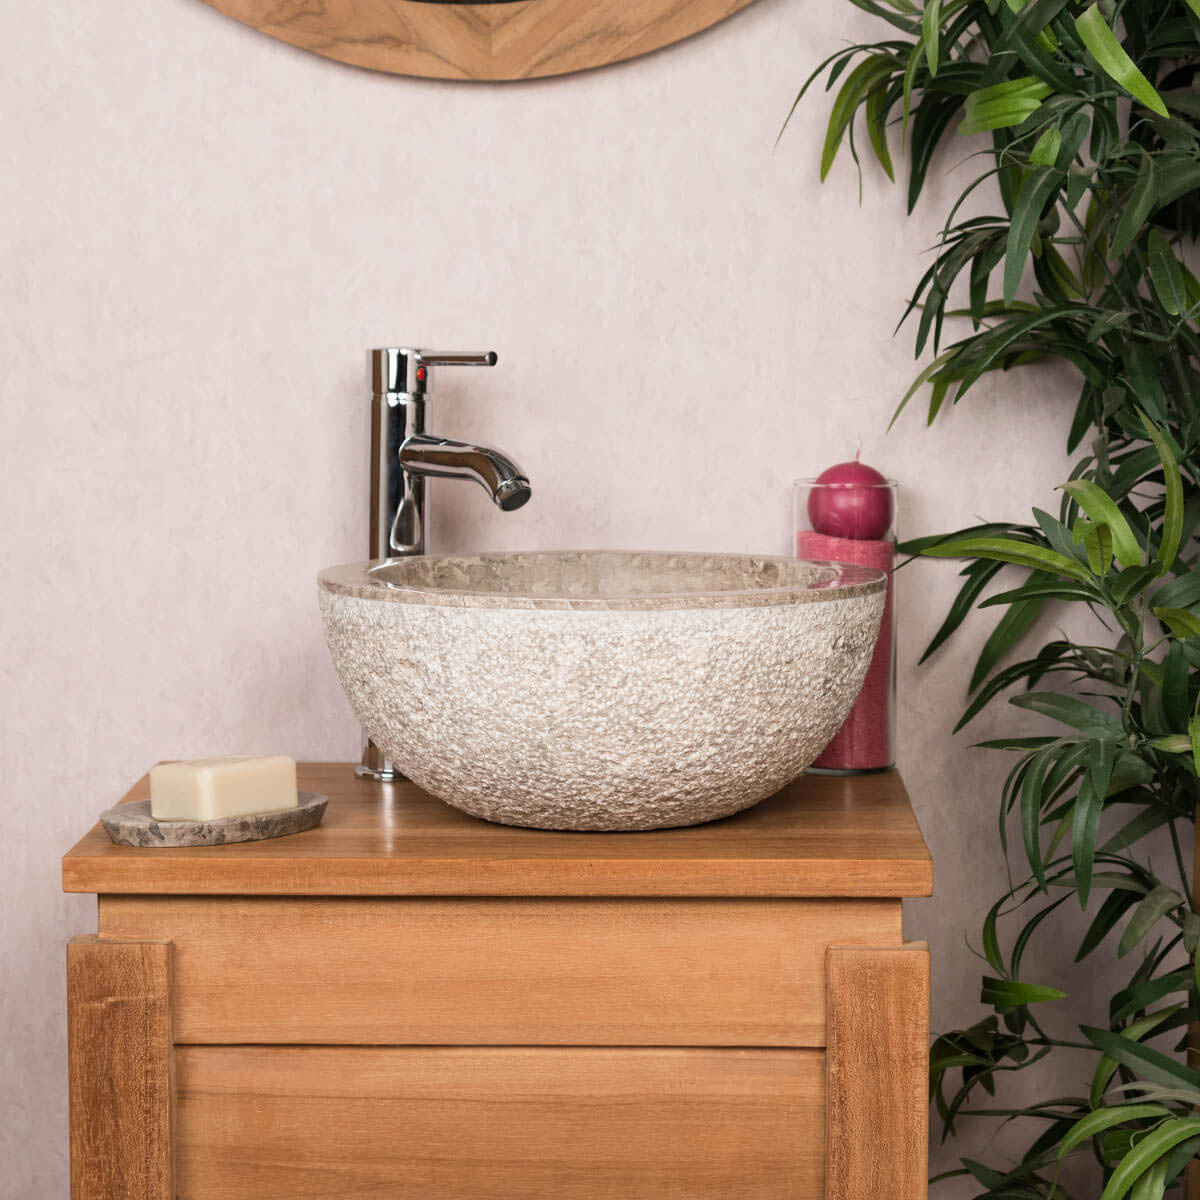 lave mains de wc poser en marbre stromboli gris taupe d 35 cm. Black Bedroom Furniture Sets. Home Design Ideas